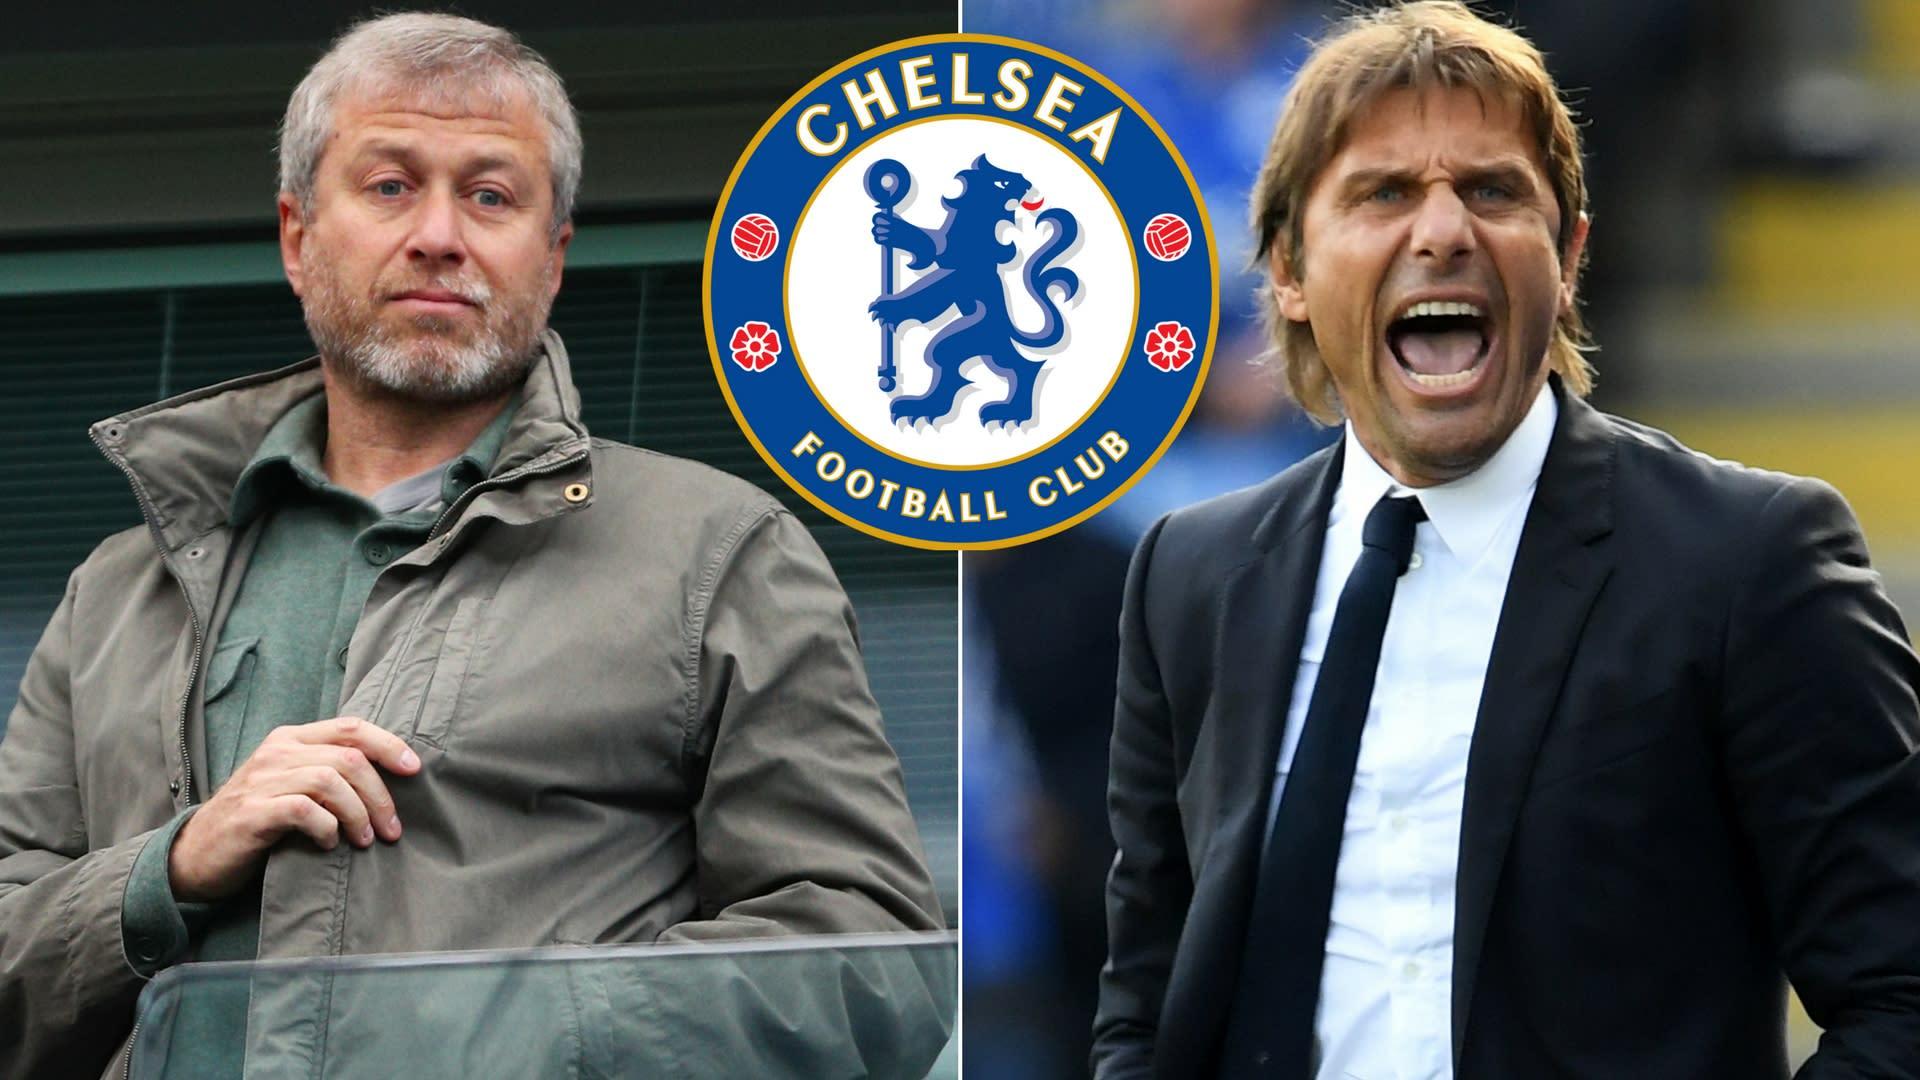 Revealed: Why Roman Abramovich has delayed sacking Chelsea coach Antonio Conte